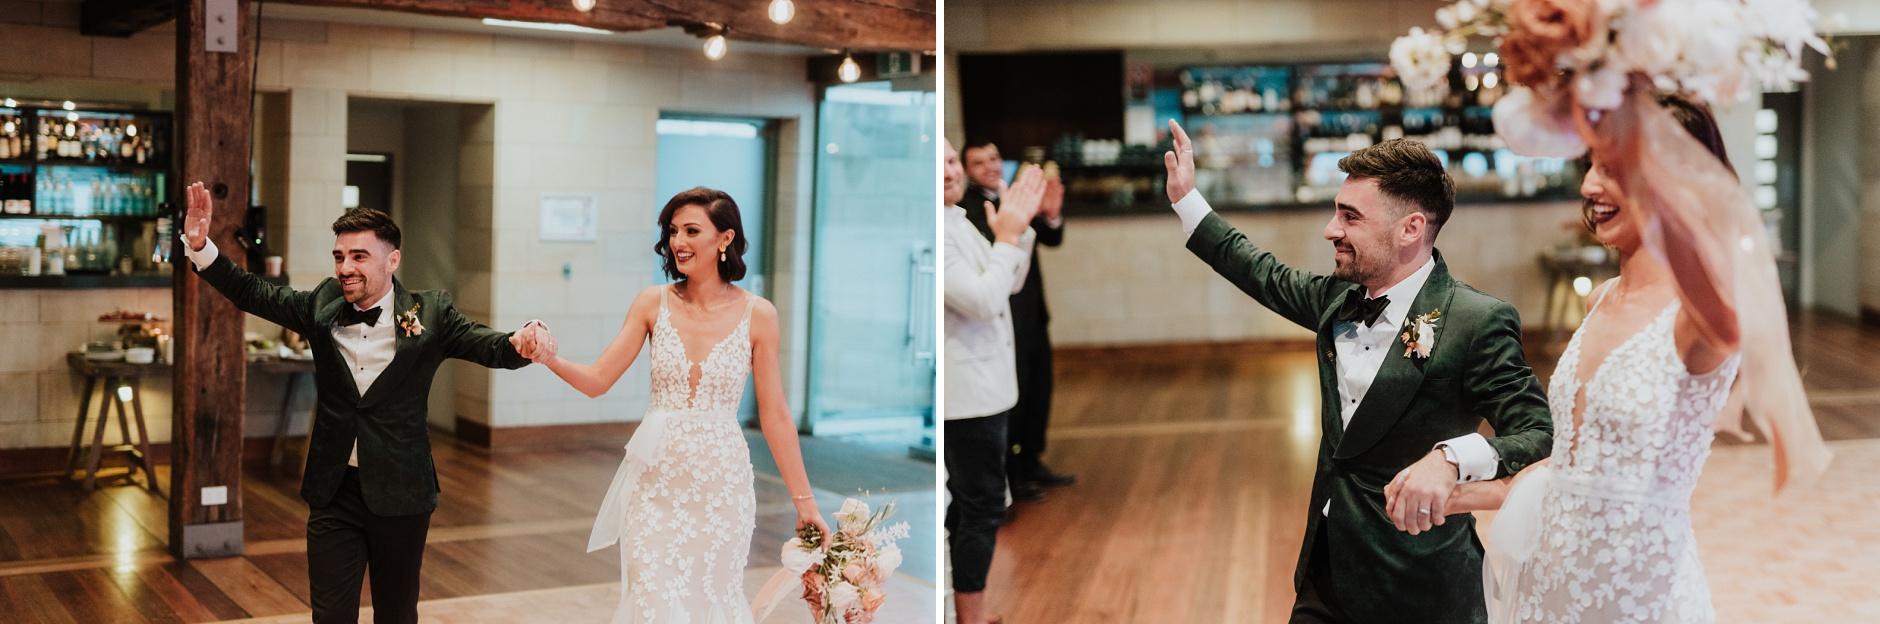 Sydney-Wedding-Photographer_0152.jpg